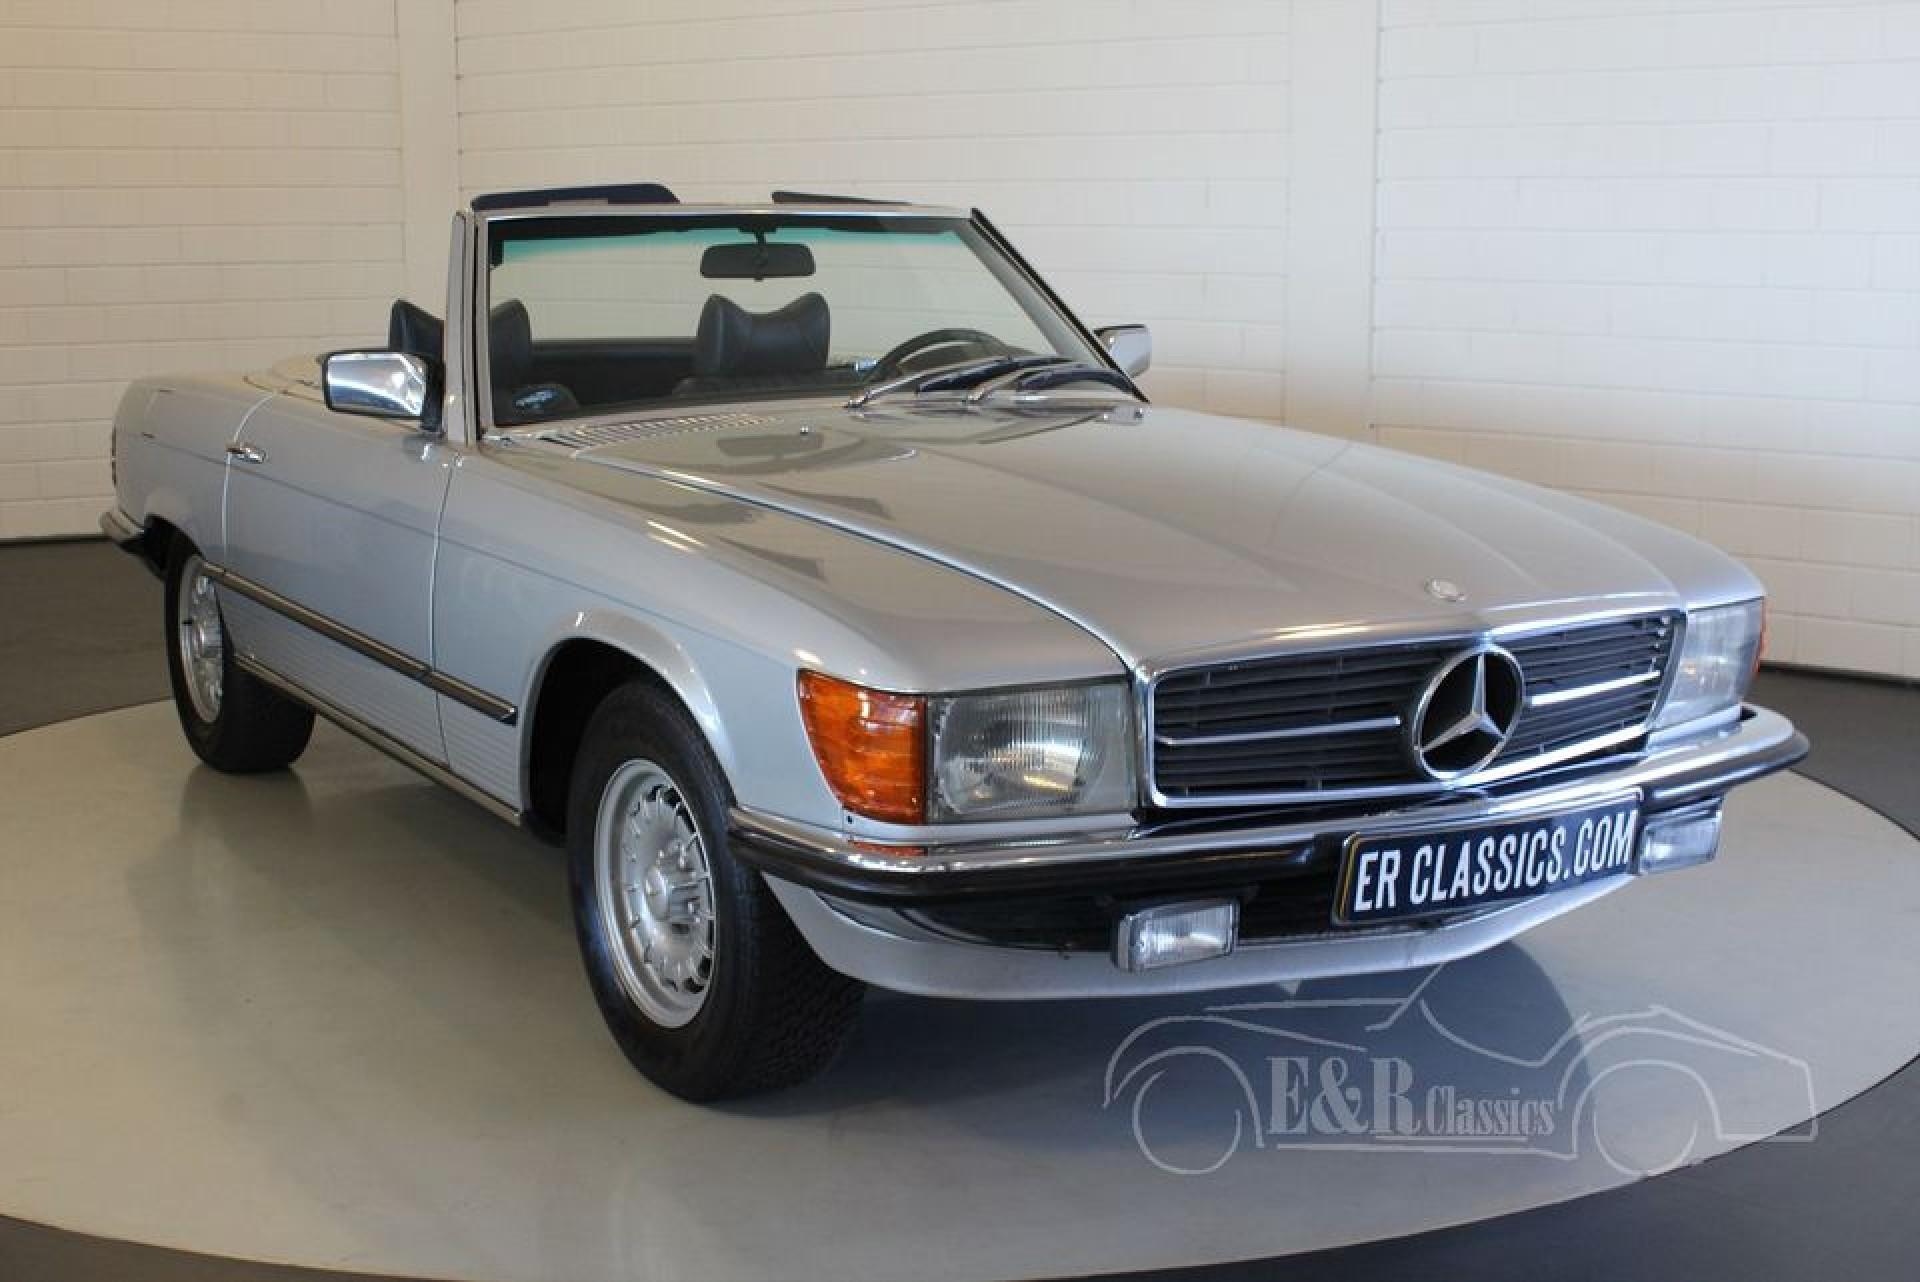 mercedes benz 280 sl cabriolet 1978 for sale at erclassics. Black Bedroom Furniture Sets. Home Design Ideas